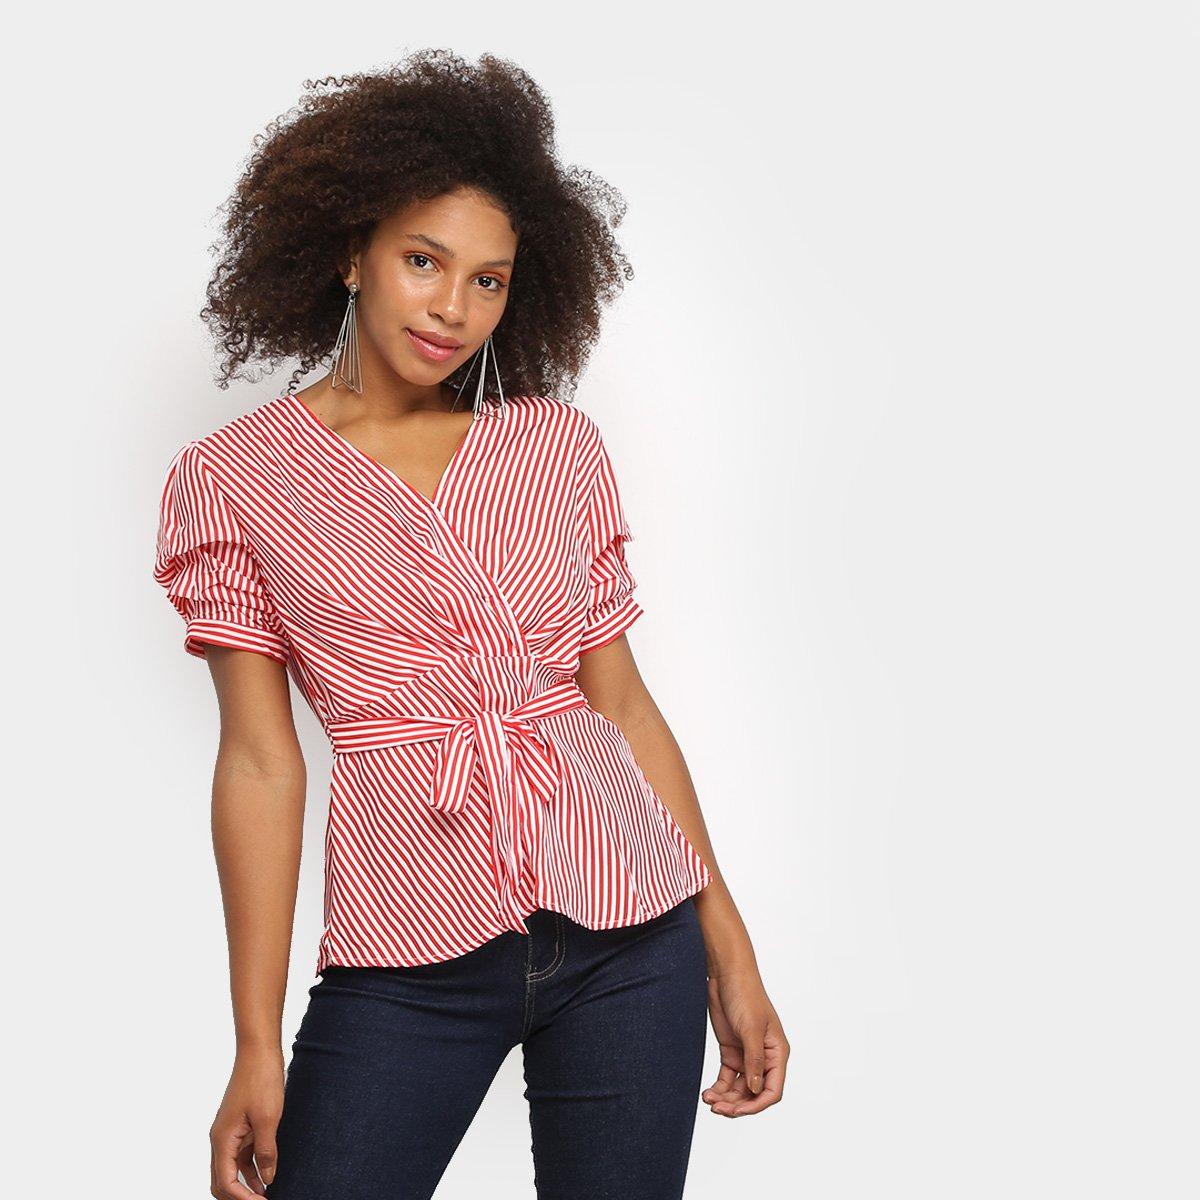 Blusa Lily Fashion Listrada Transpassada Faixa Feminina - Vermelho F15CF1Dd